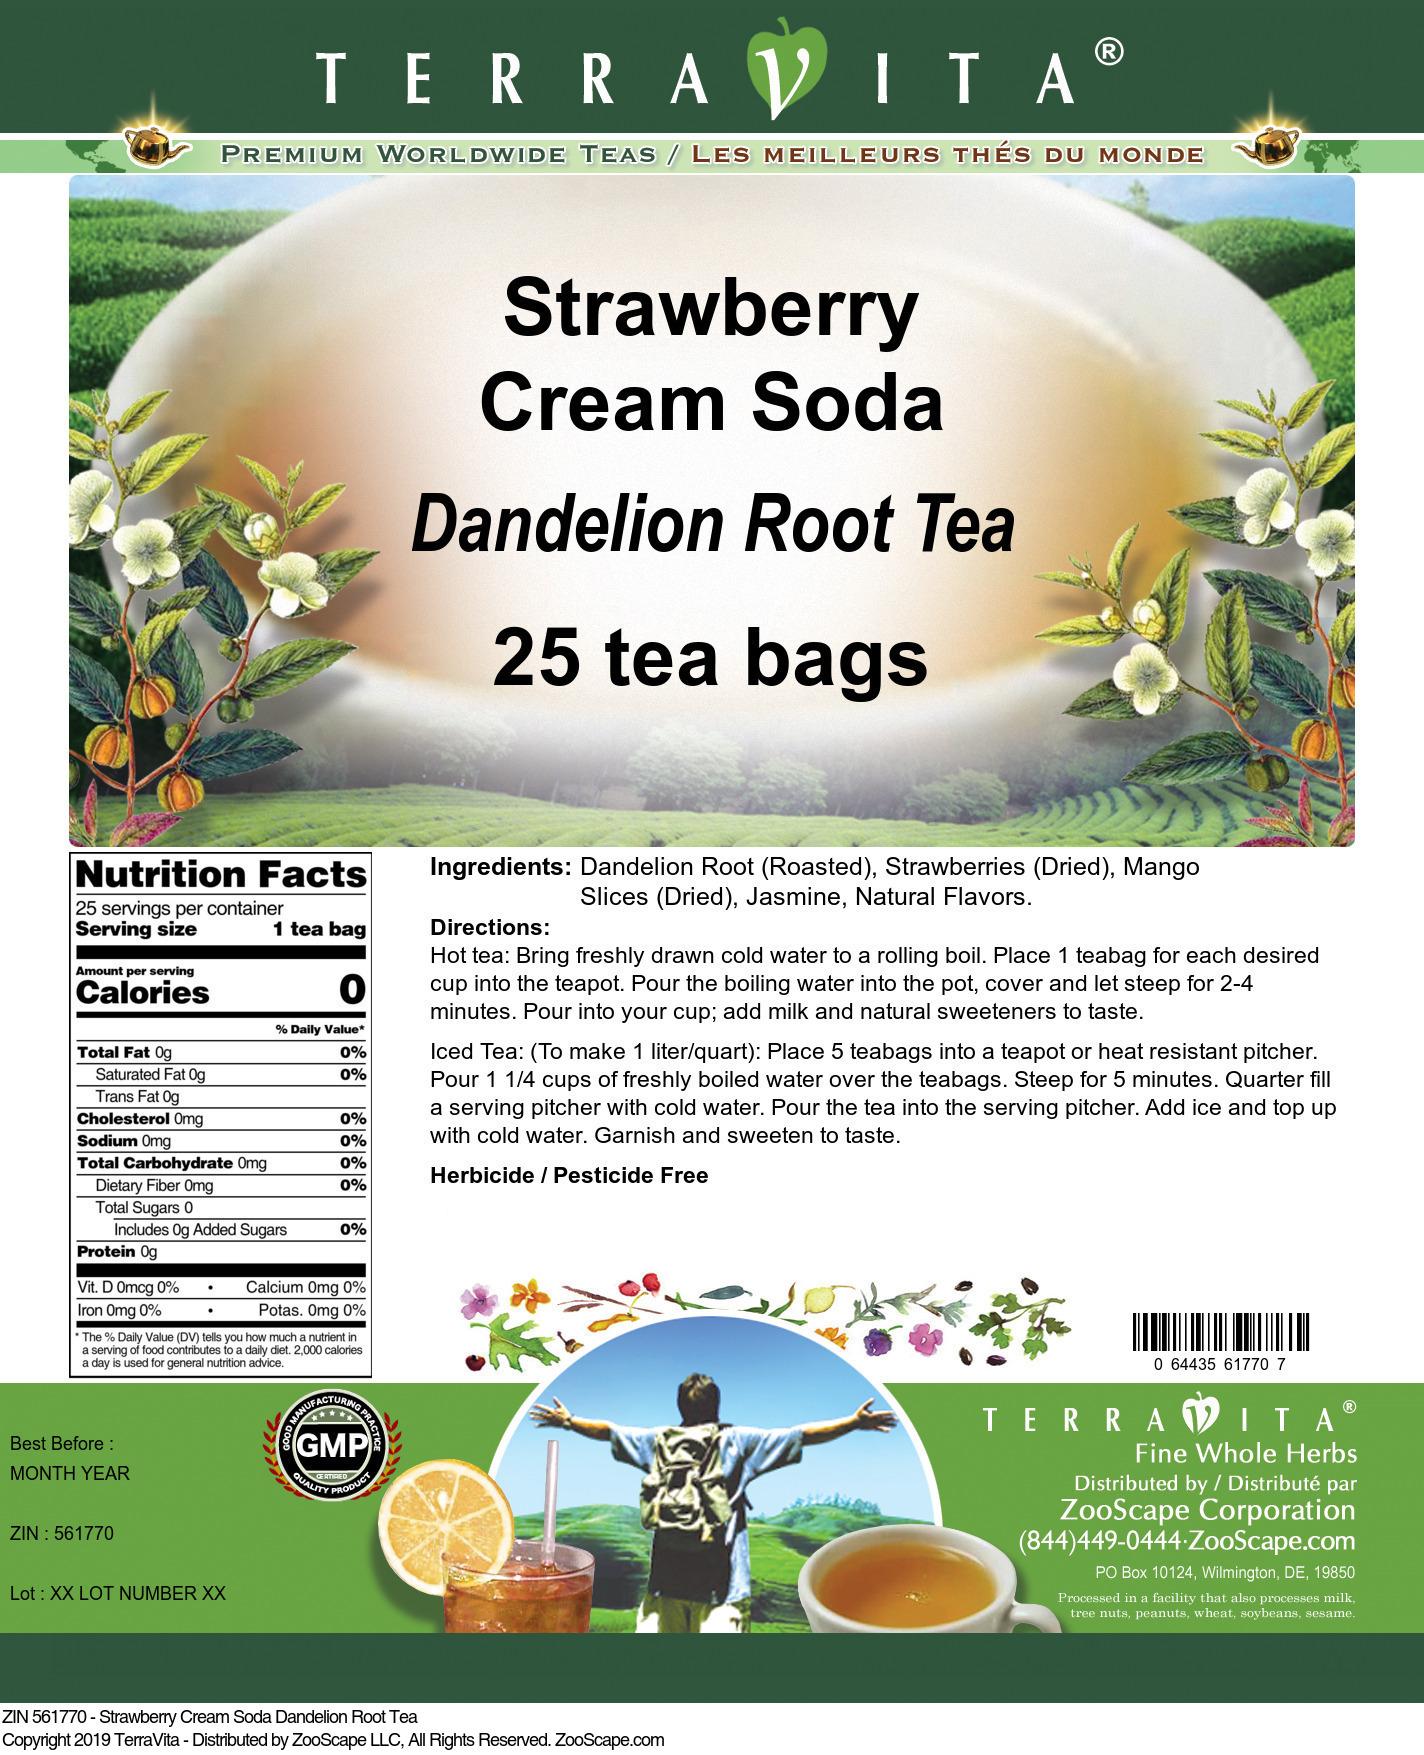 Strawberry Cream Soda Dandelion Root Tea